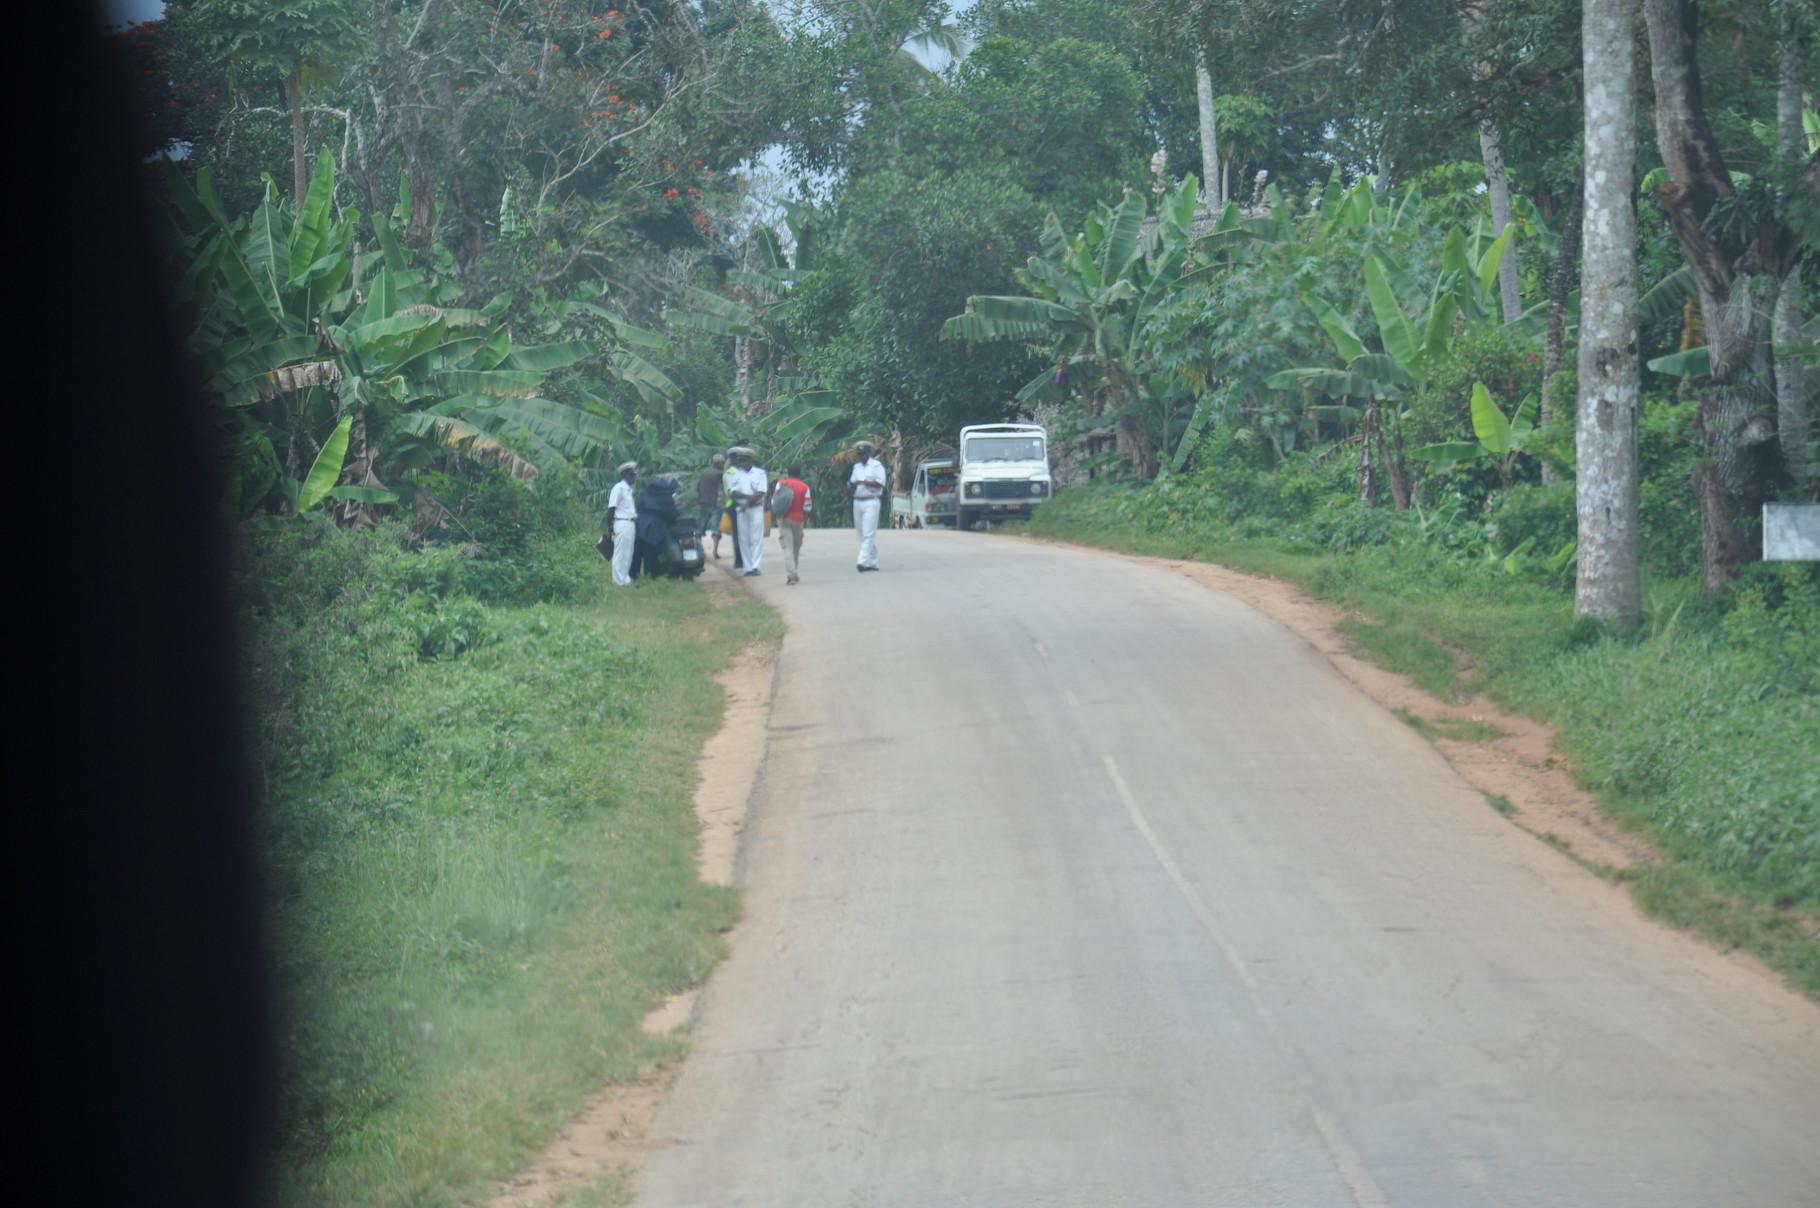 sur la route principale